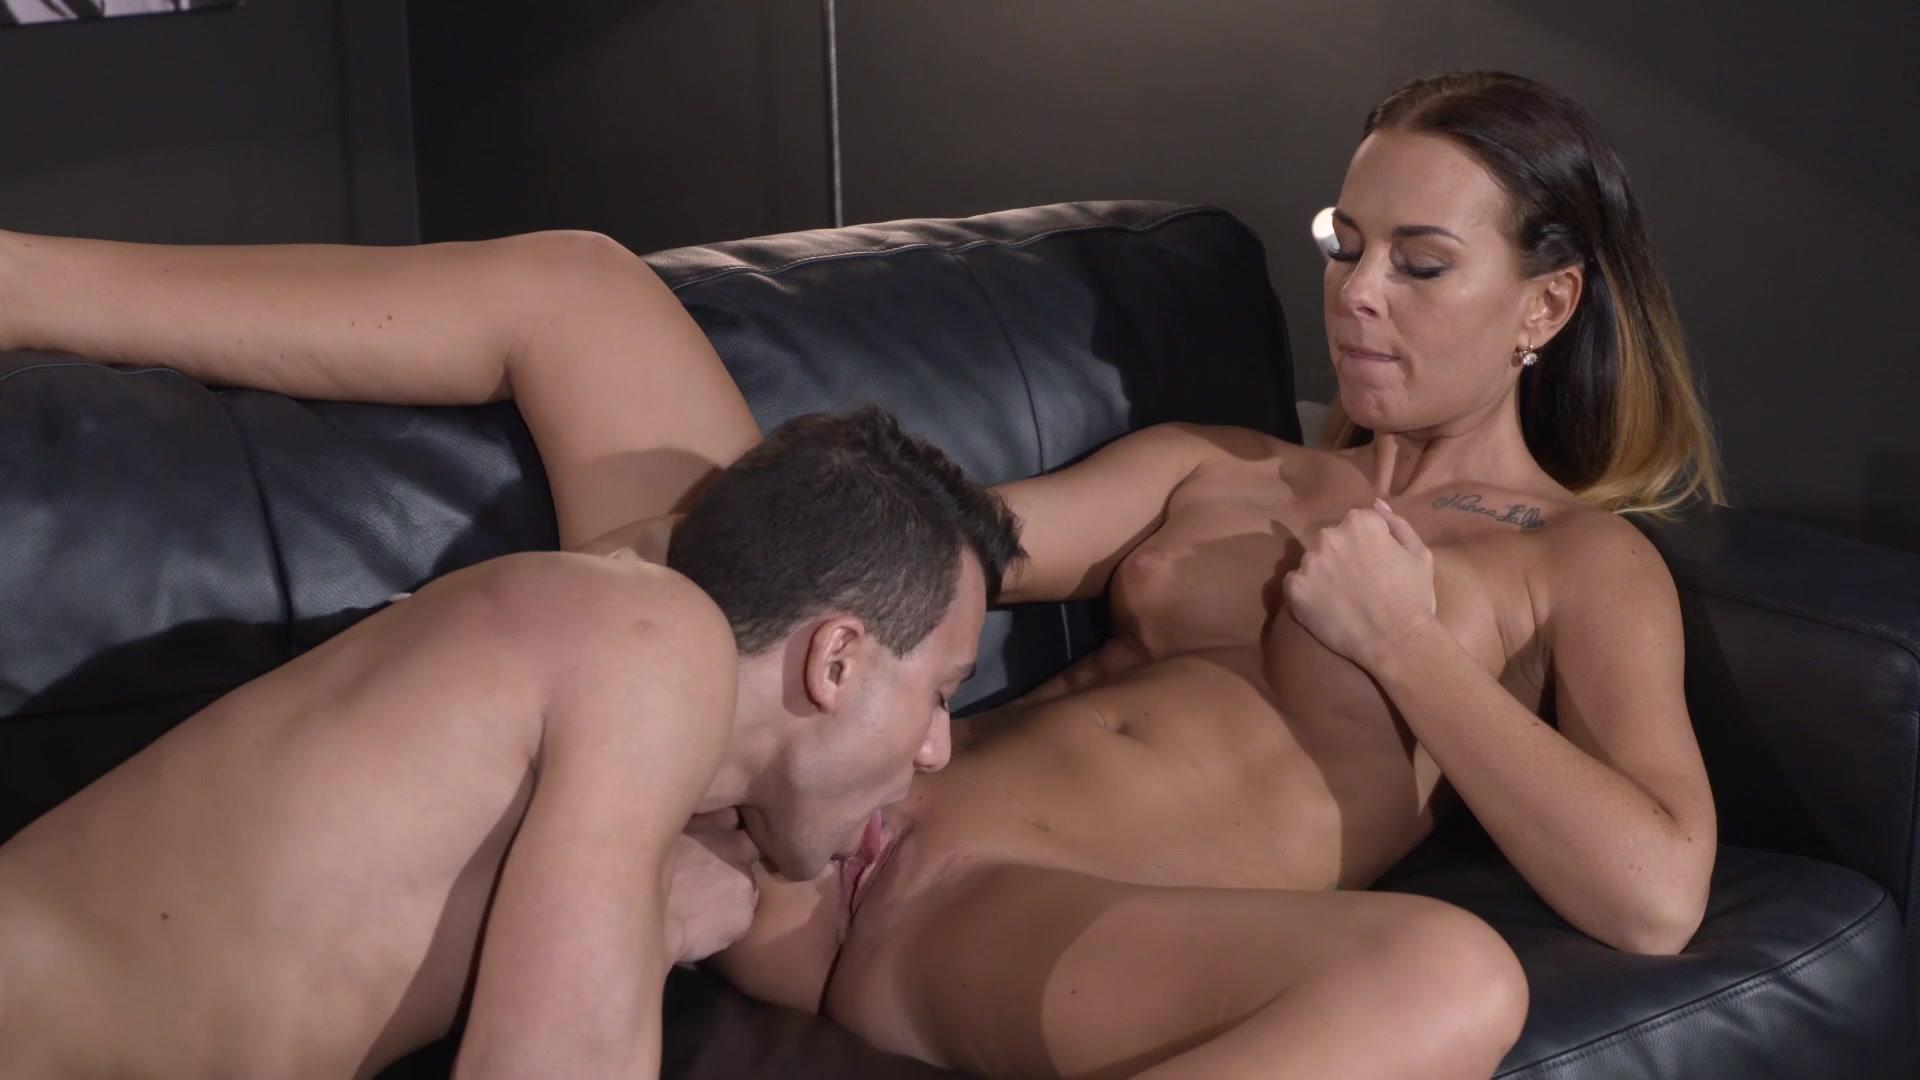 zack efron sex video